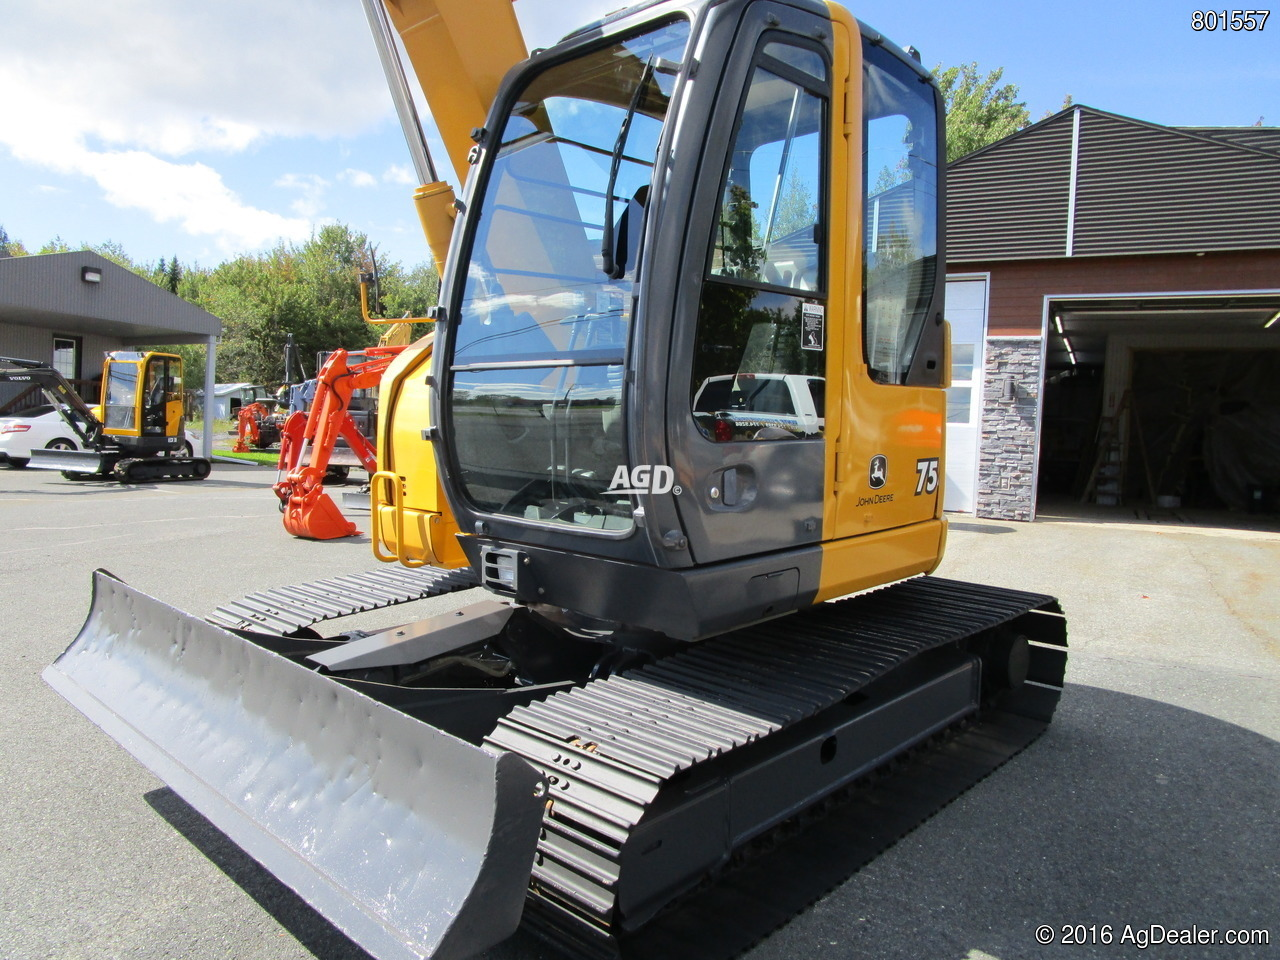 2007 John Deere 75c Excavator For Sale   AgDealer.com